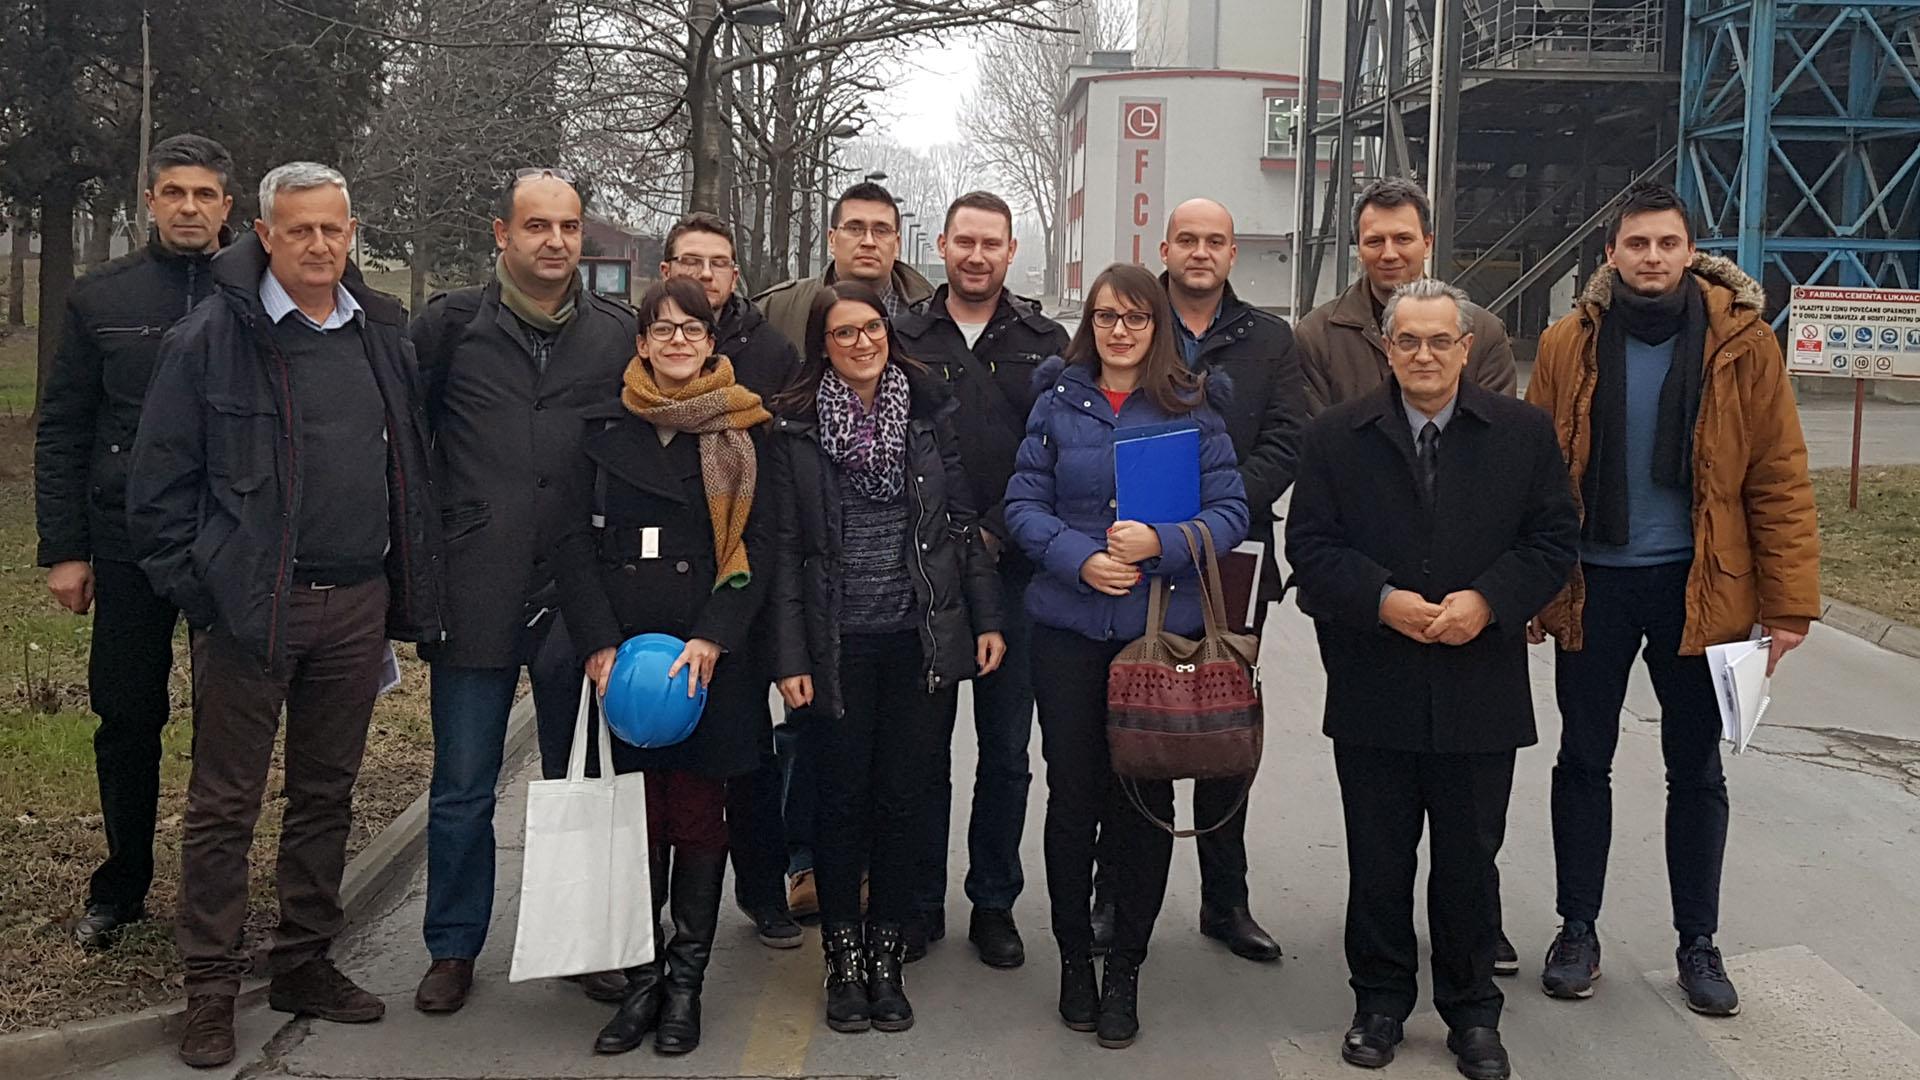 FCL / Fabrika cementa Lukavac / In-house seminar i radionica